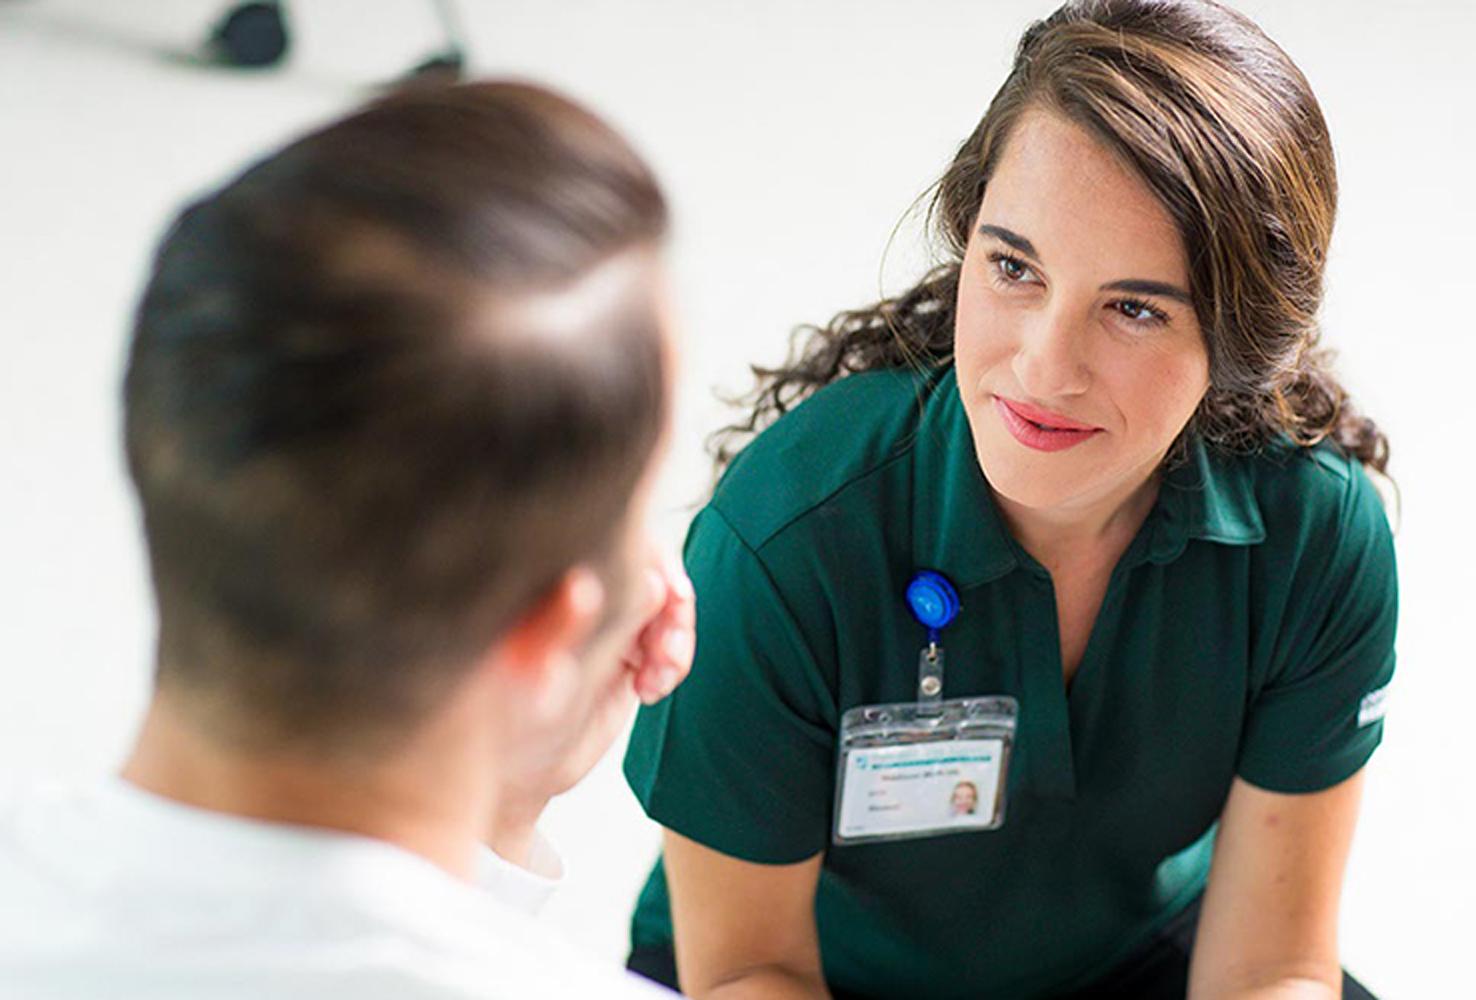 Nurse in a green coat speaking to patient.